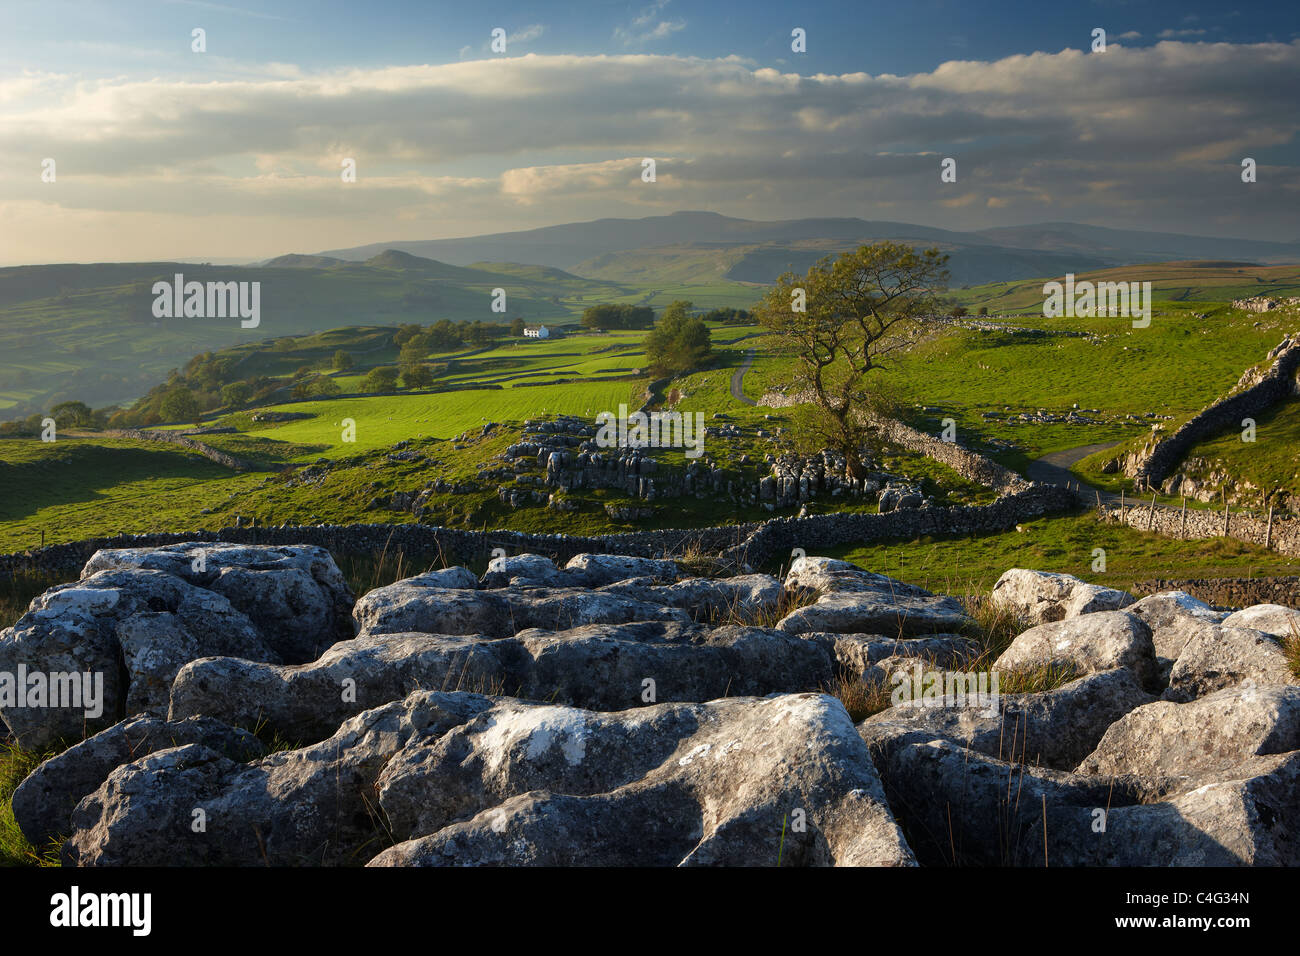 Winskill Stones, Ribblesdale, Yorkshire Dales National Park, England, UK - Stock Image